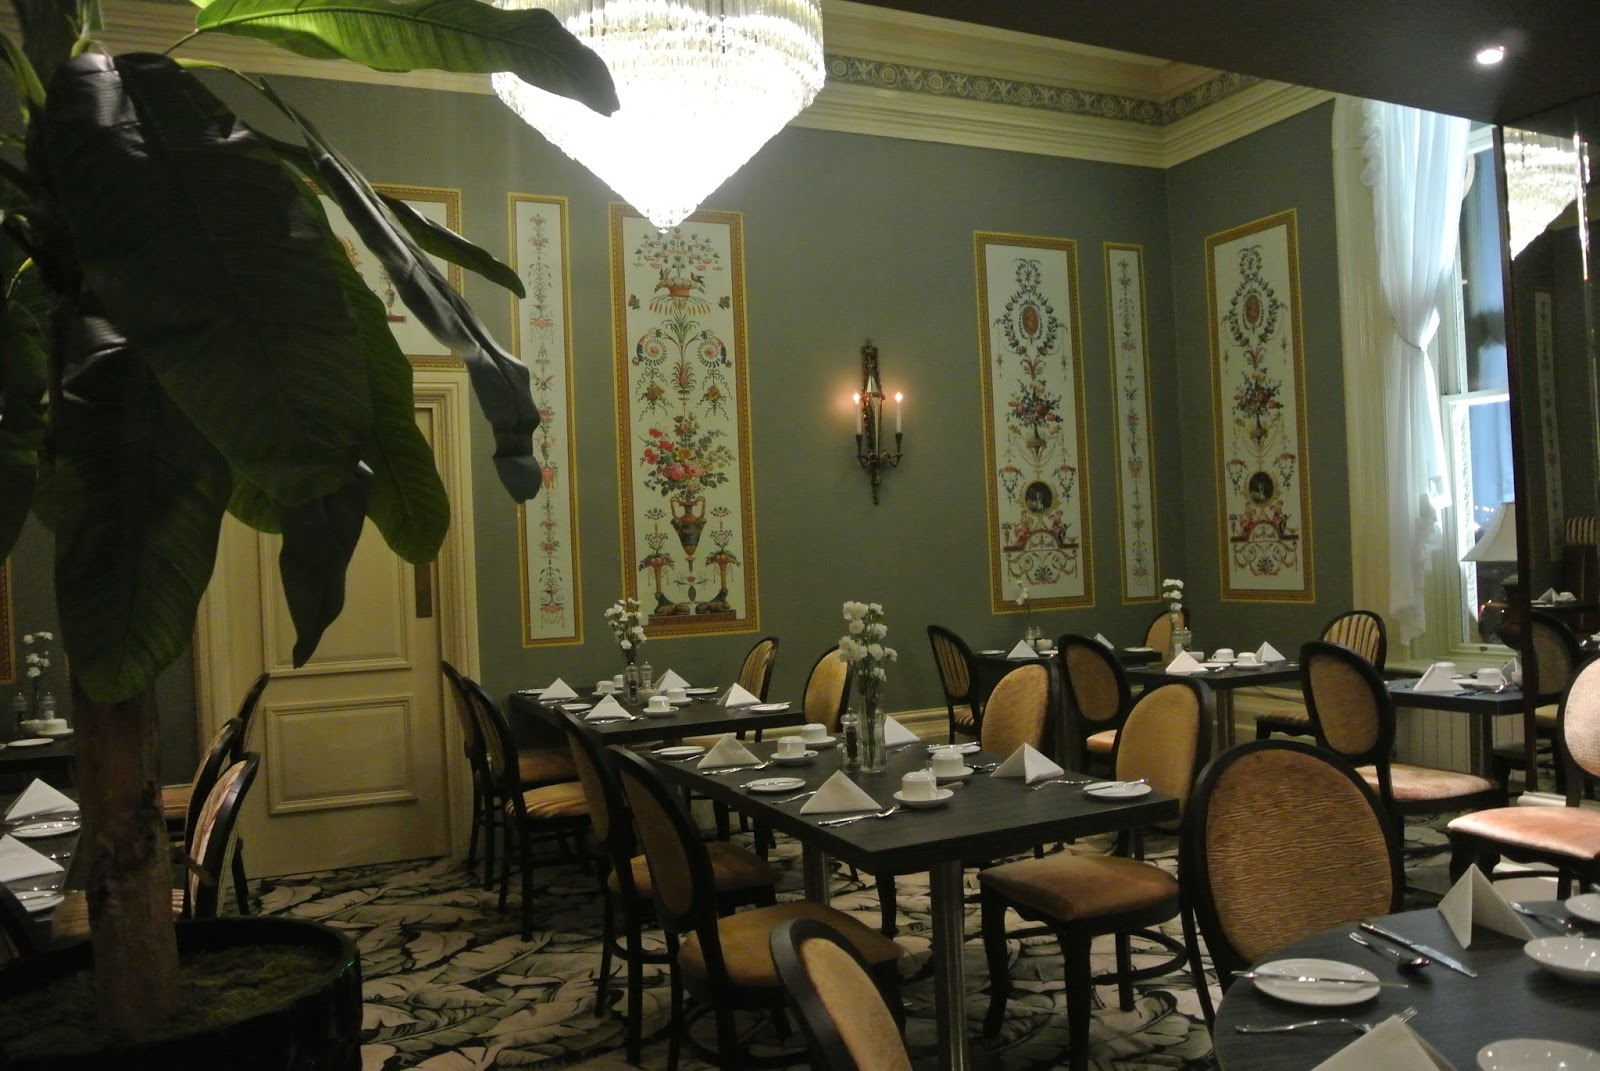 Grand Hotel Tynemouth Afternoon Tea Menu